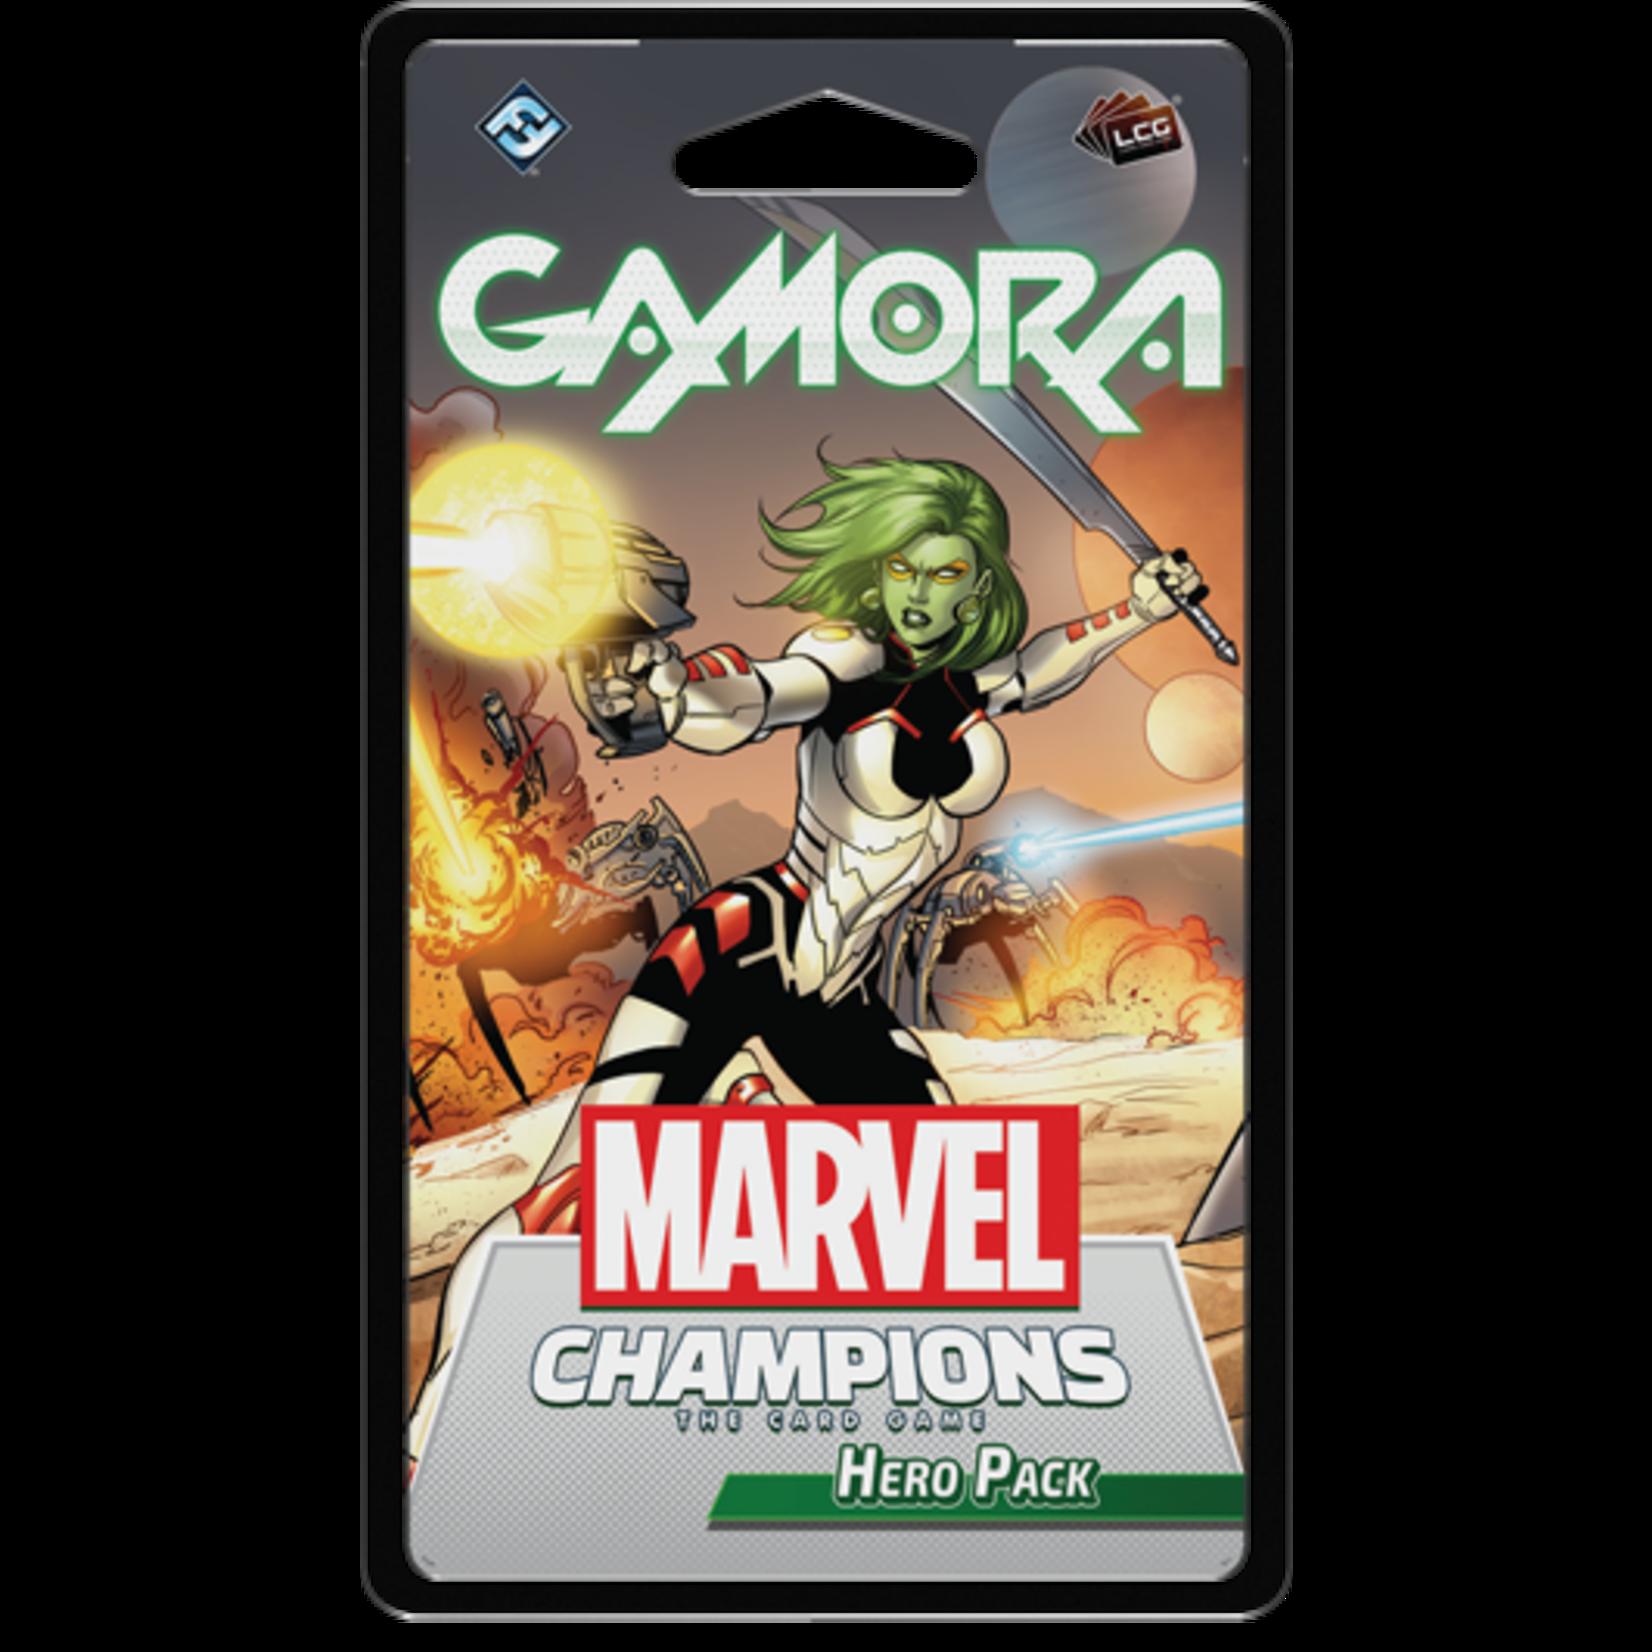 Fantasy Flight Games Marvel Champions Living Card Game: Gamora Hero Pack